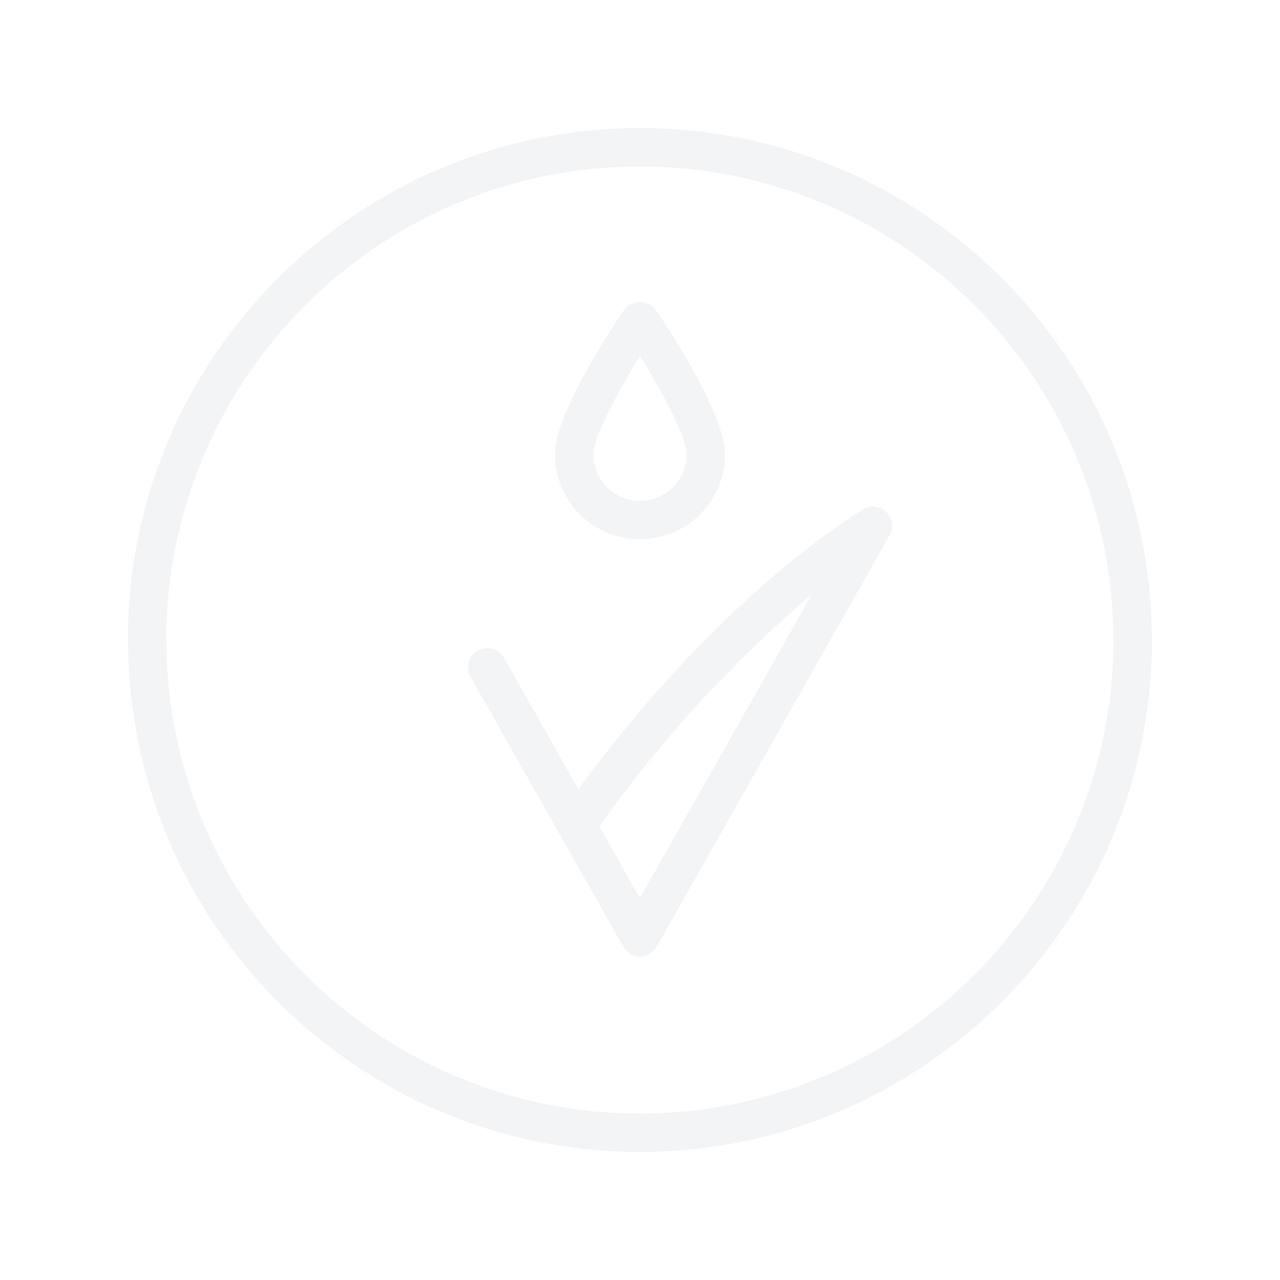 NATURA SIBERICA Taiga Daily Protection Hand Cream